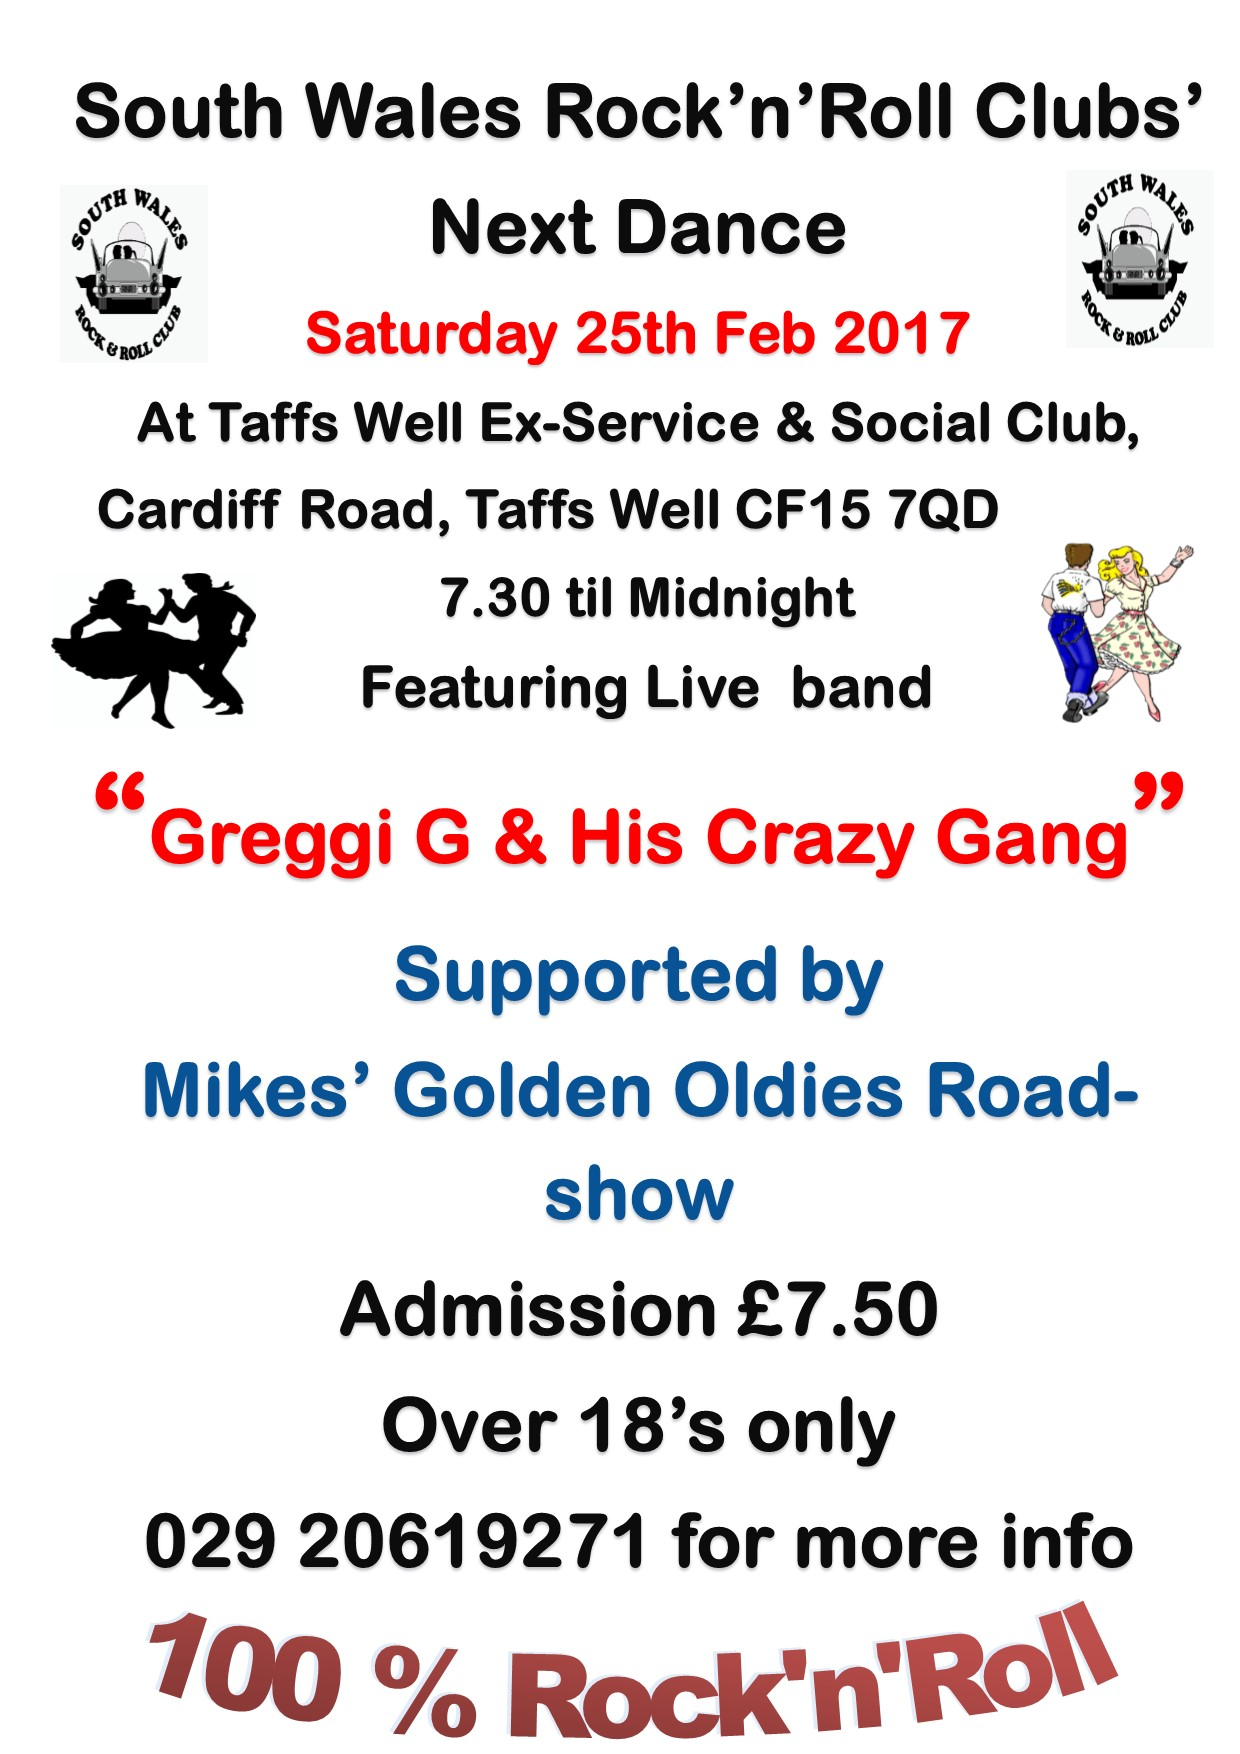 greggi g amd his crazy gang-taffs well exies=25-02-2017